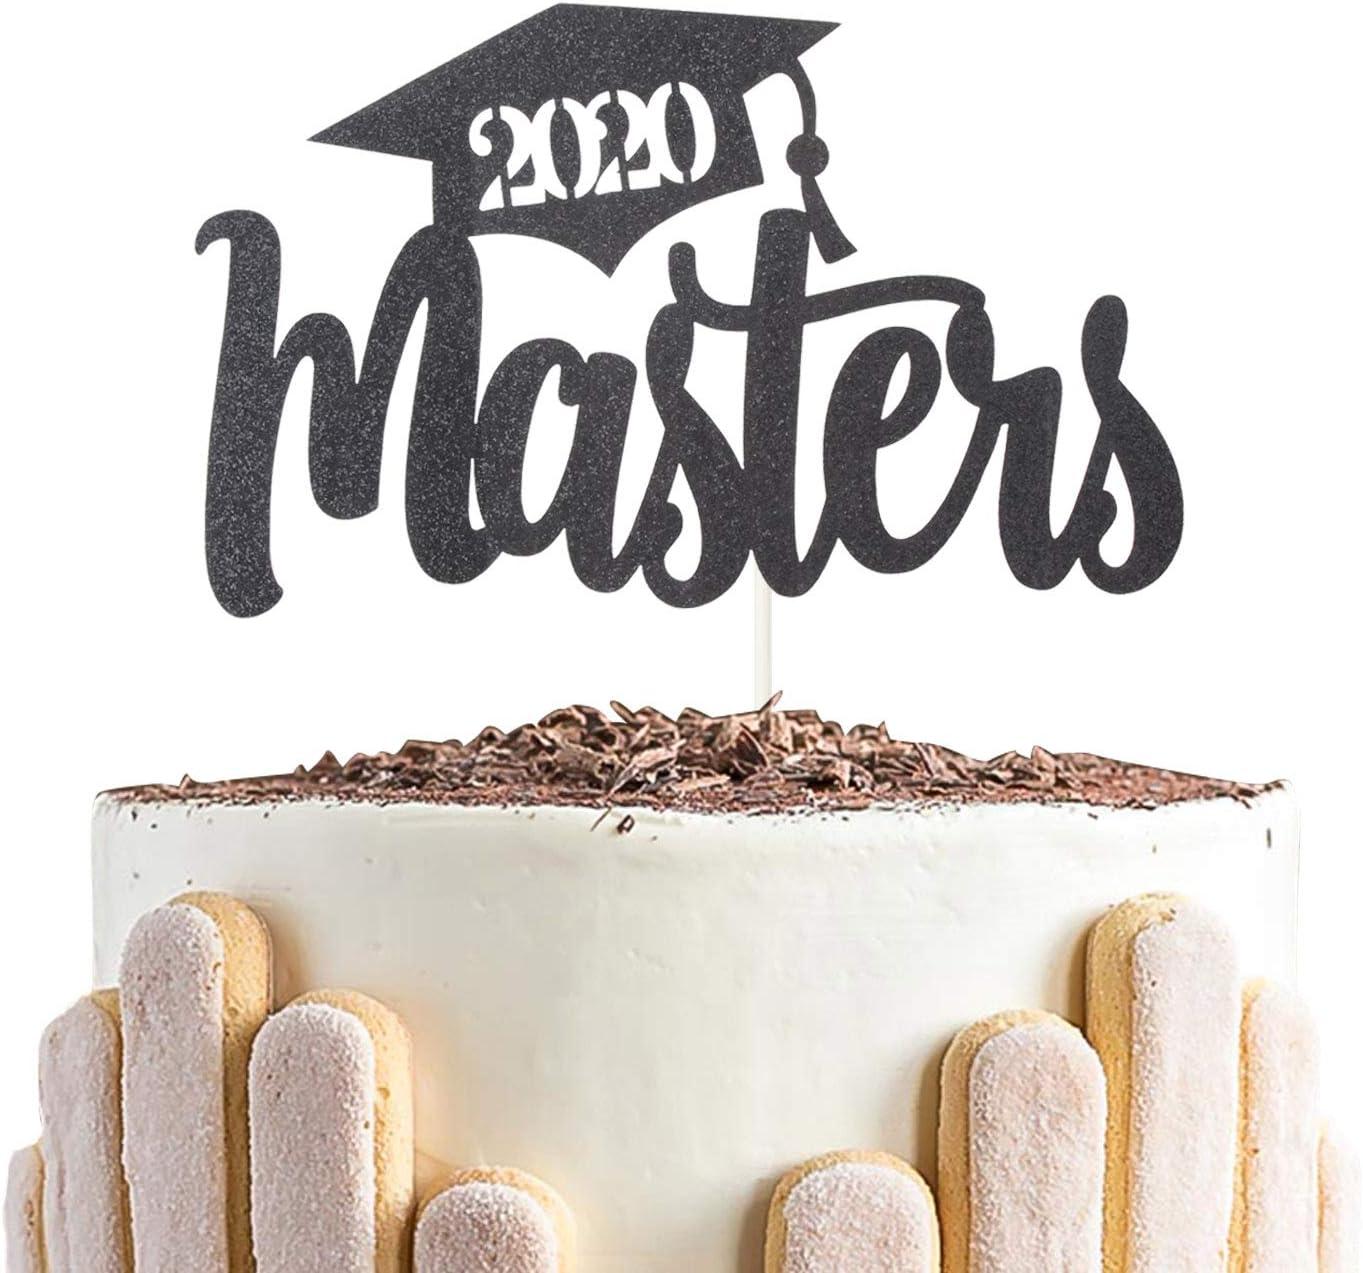 2020 Masters Cake Topper for Congrats Grads Graduate Cake Decor College Graduate Party Decorations